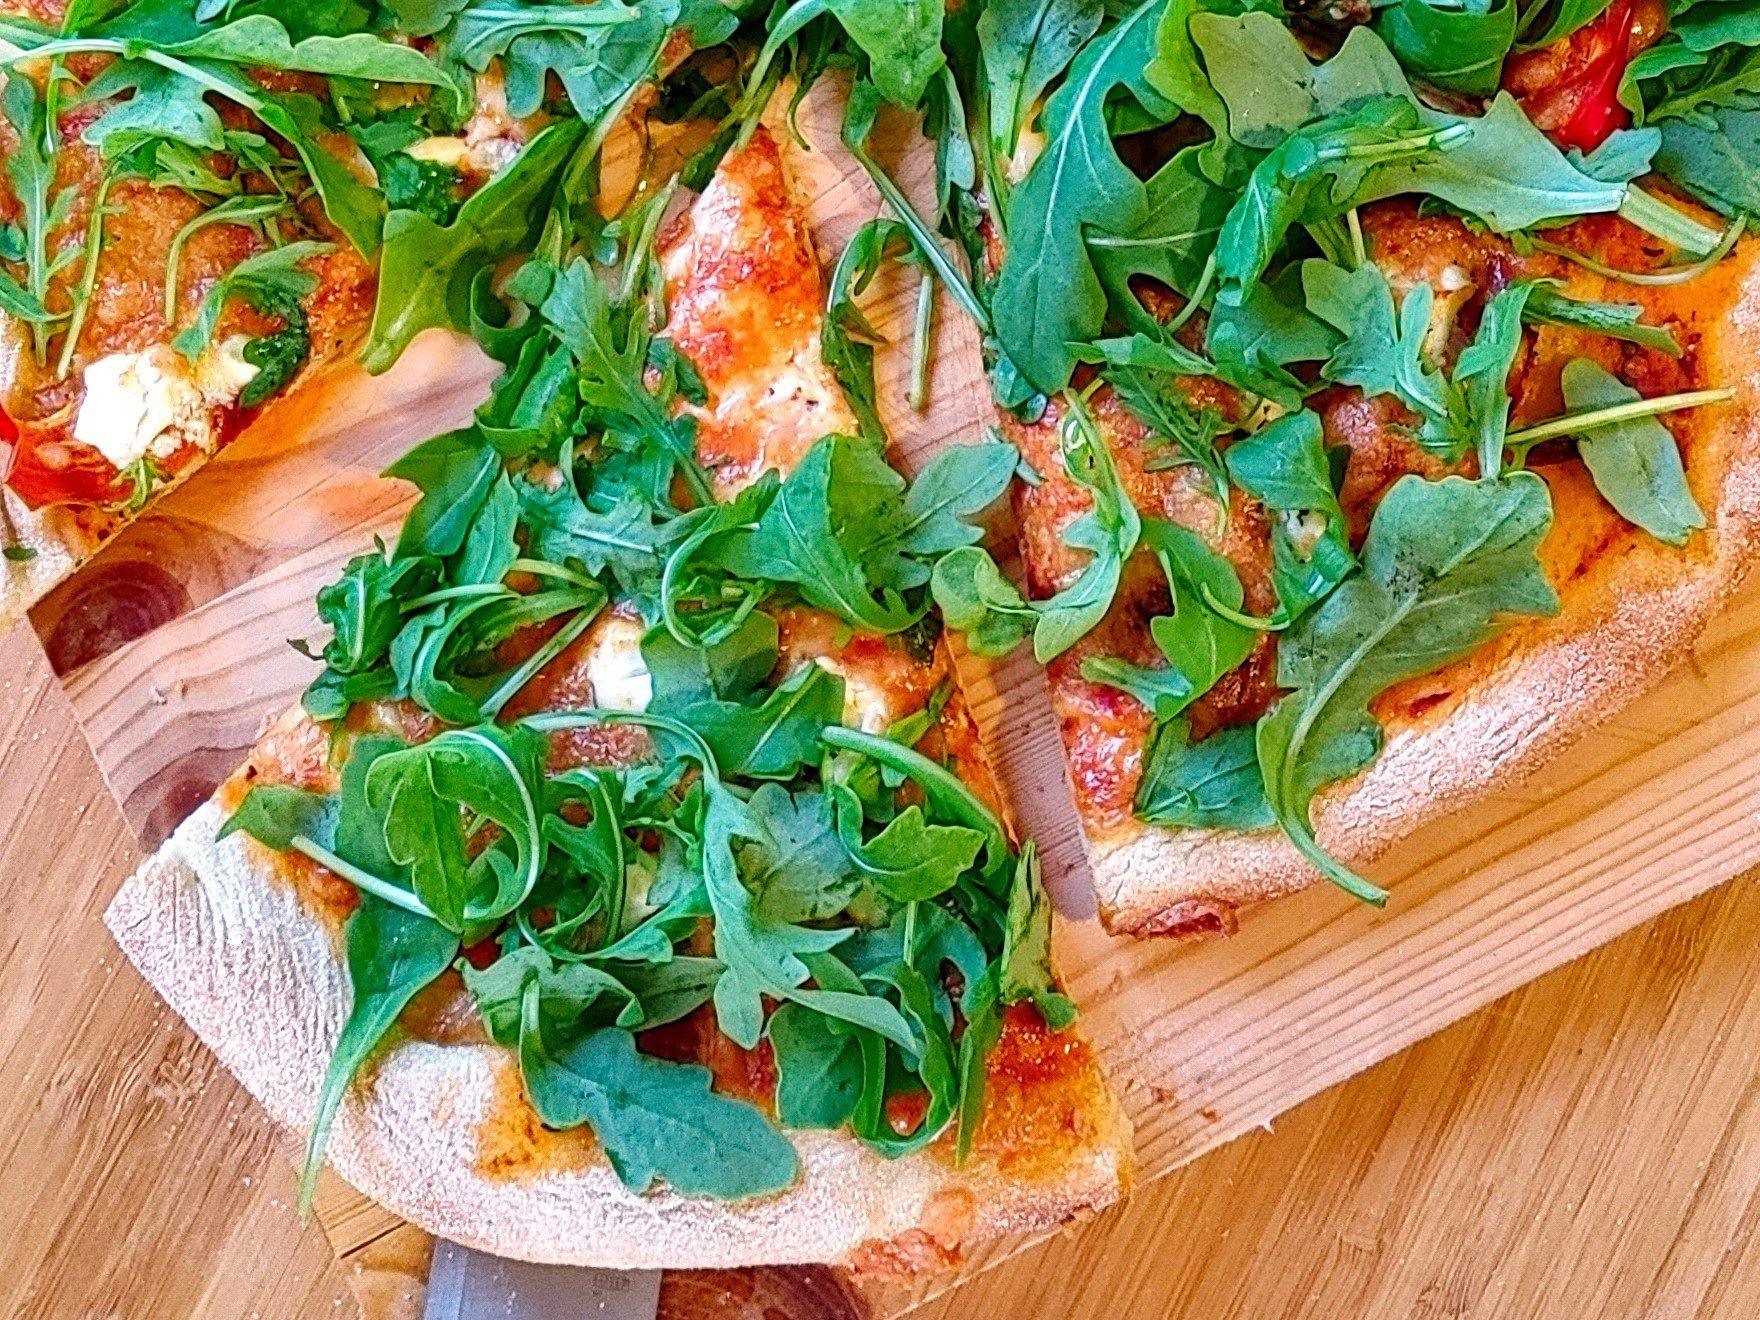 Pizza au Prosciutto et Pesto de Dulse